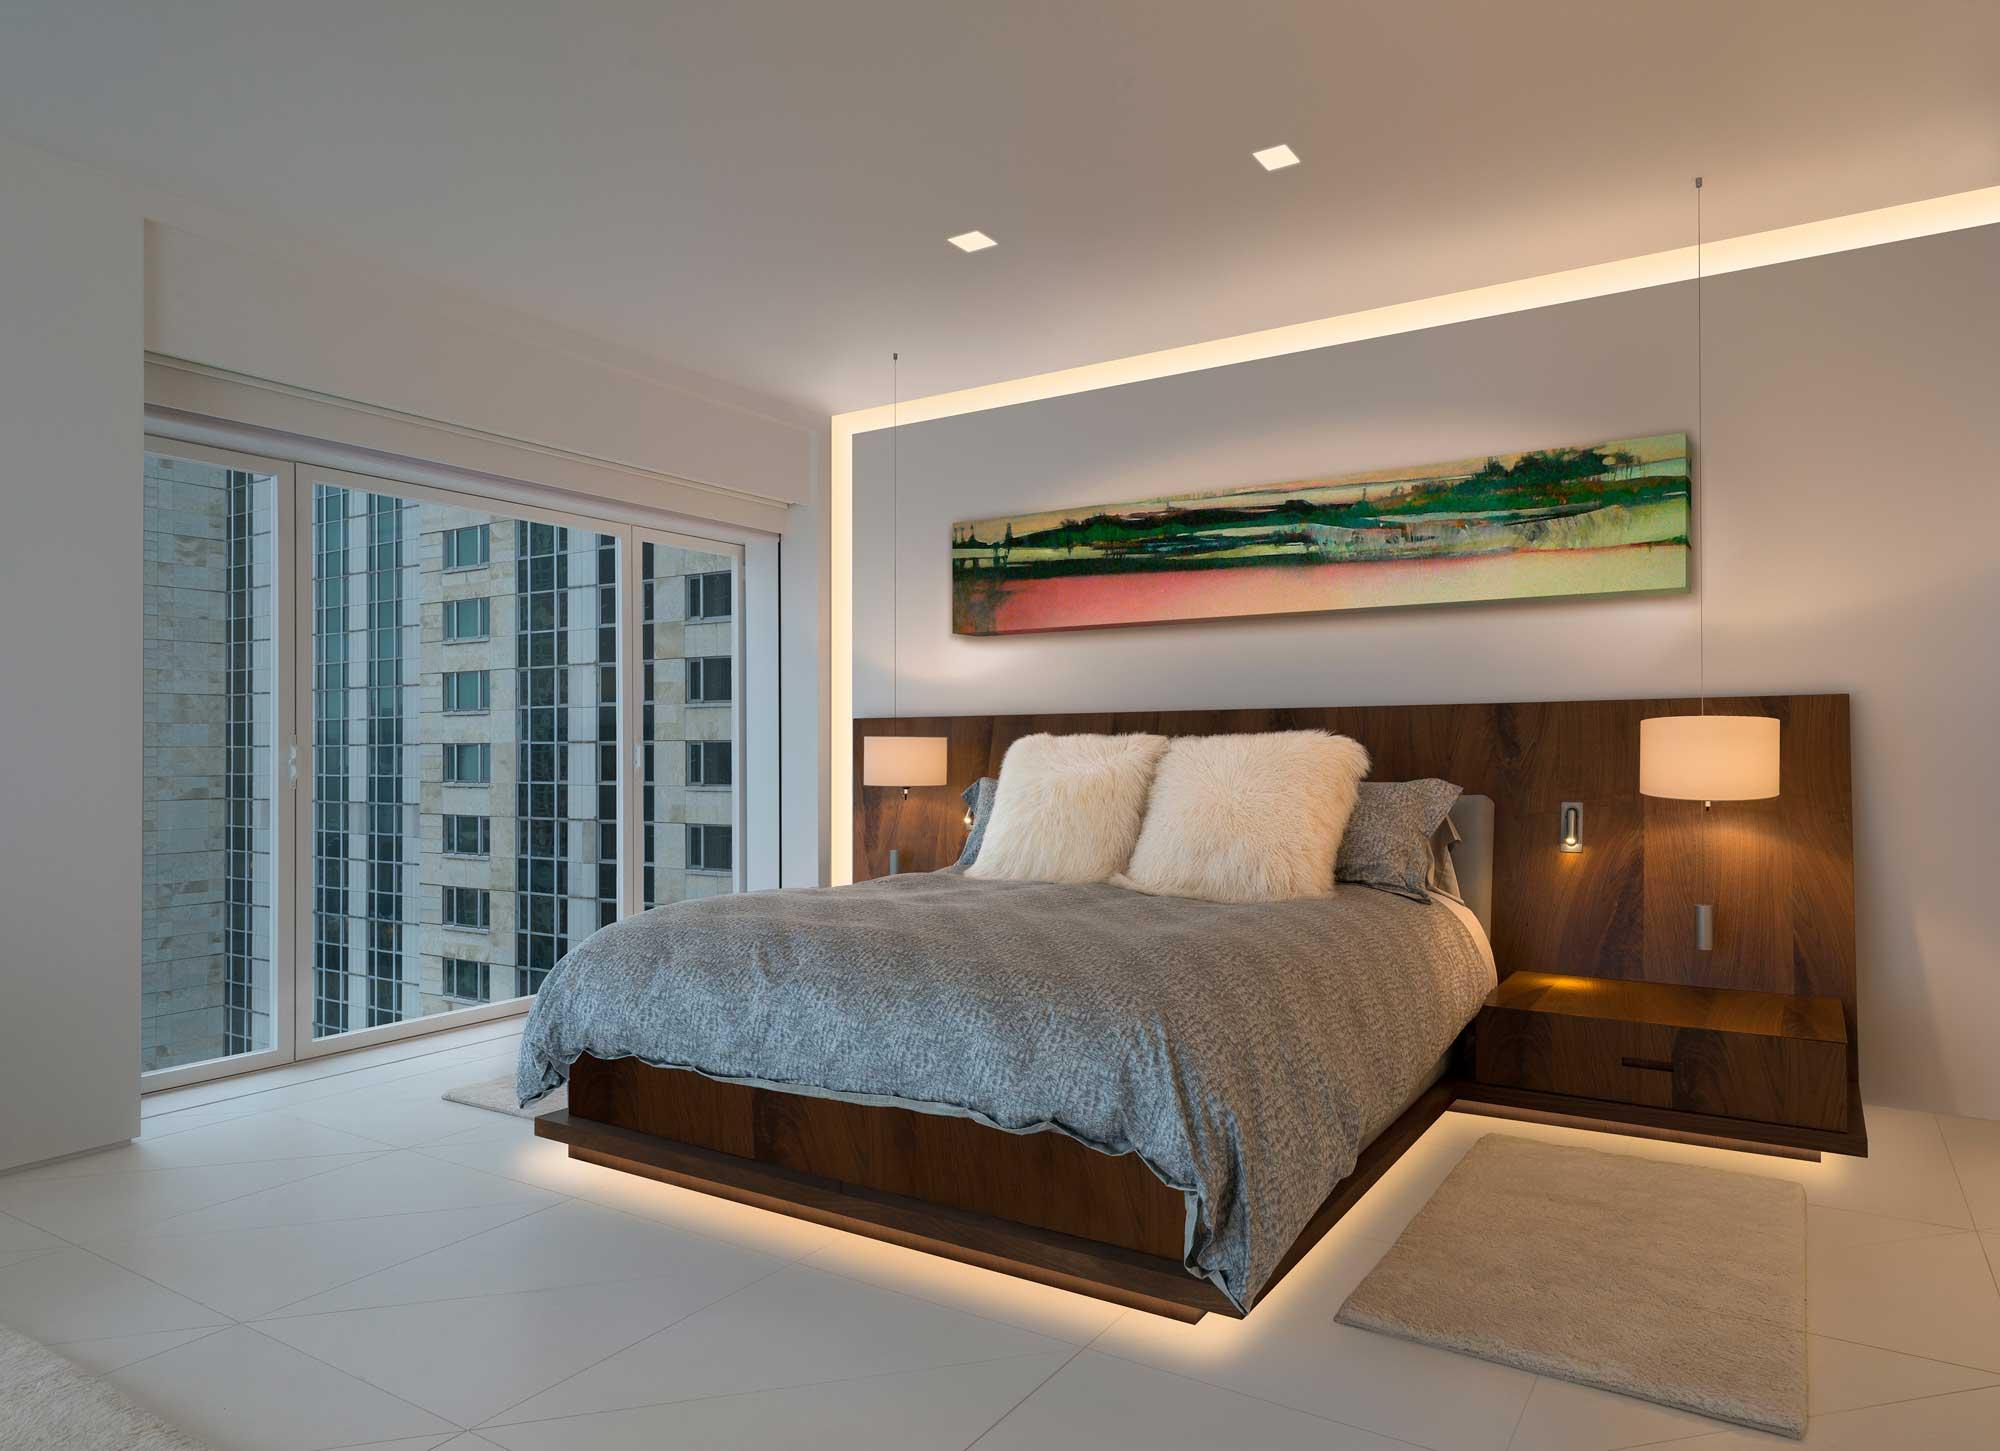 Installation Gallery | Bedroom Lighting | Ceiling Lighting